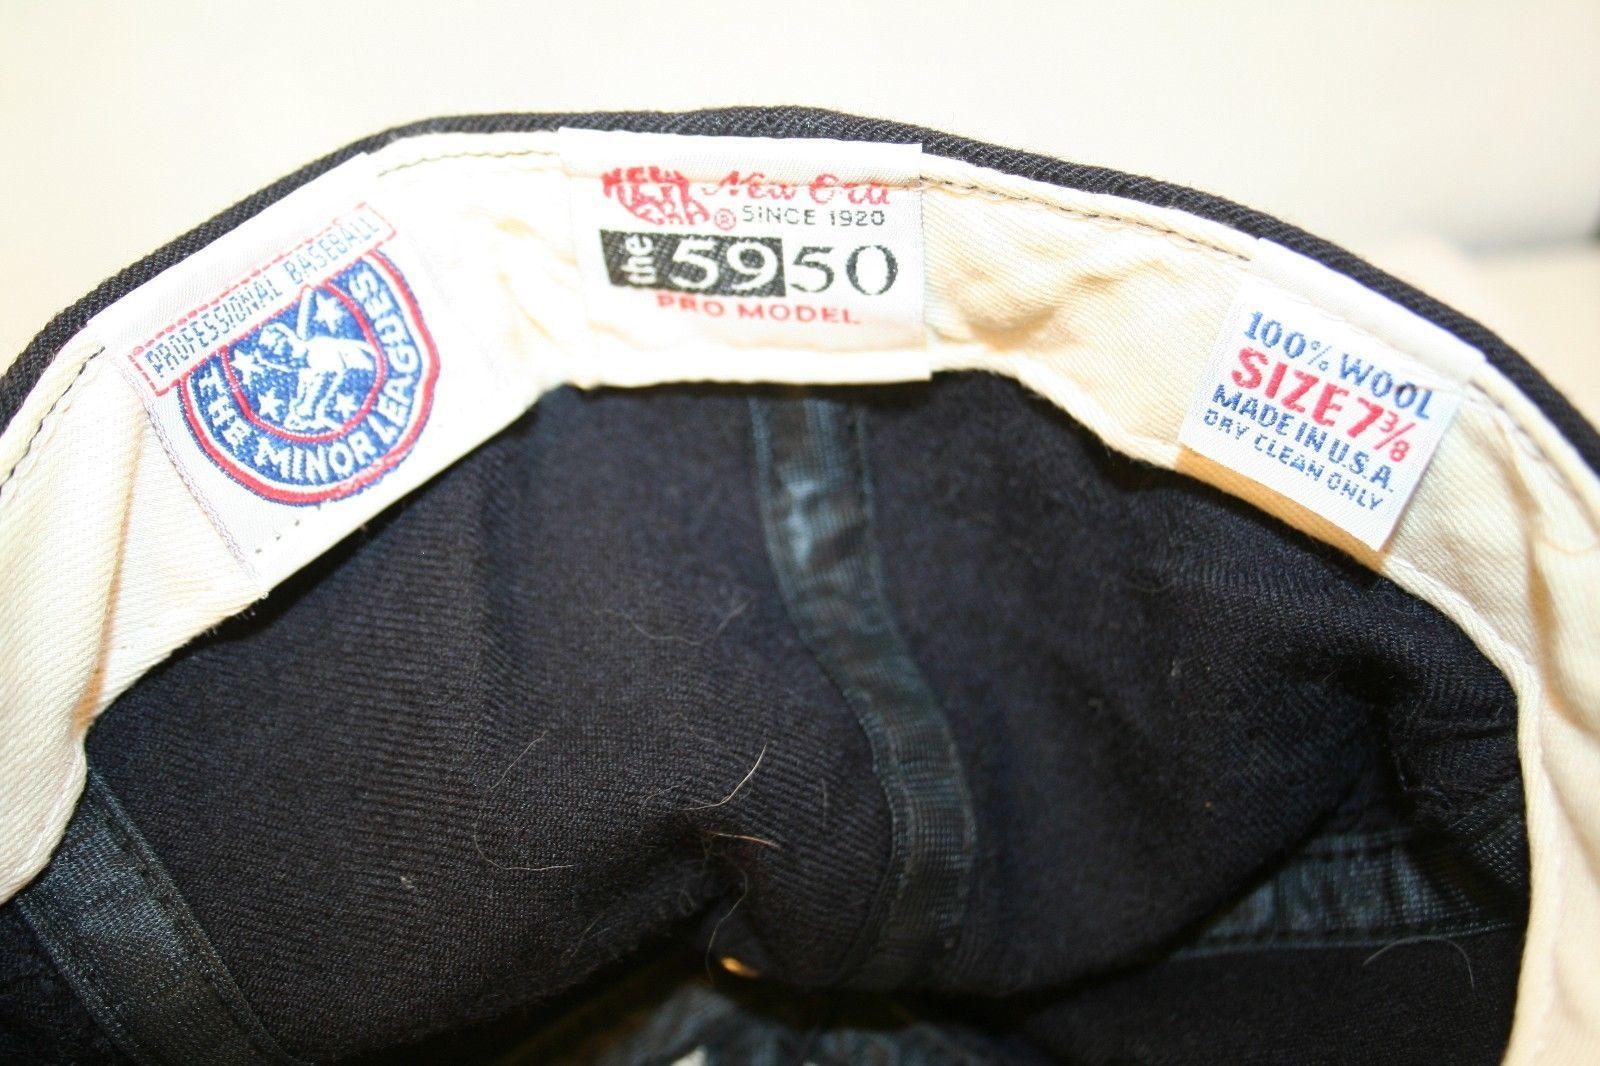 Everett WA Aquasox MiLB New Era 5950 Soggy Froggy logo Black 7 3/8 Cap Hat USA